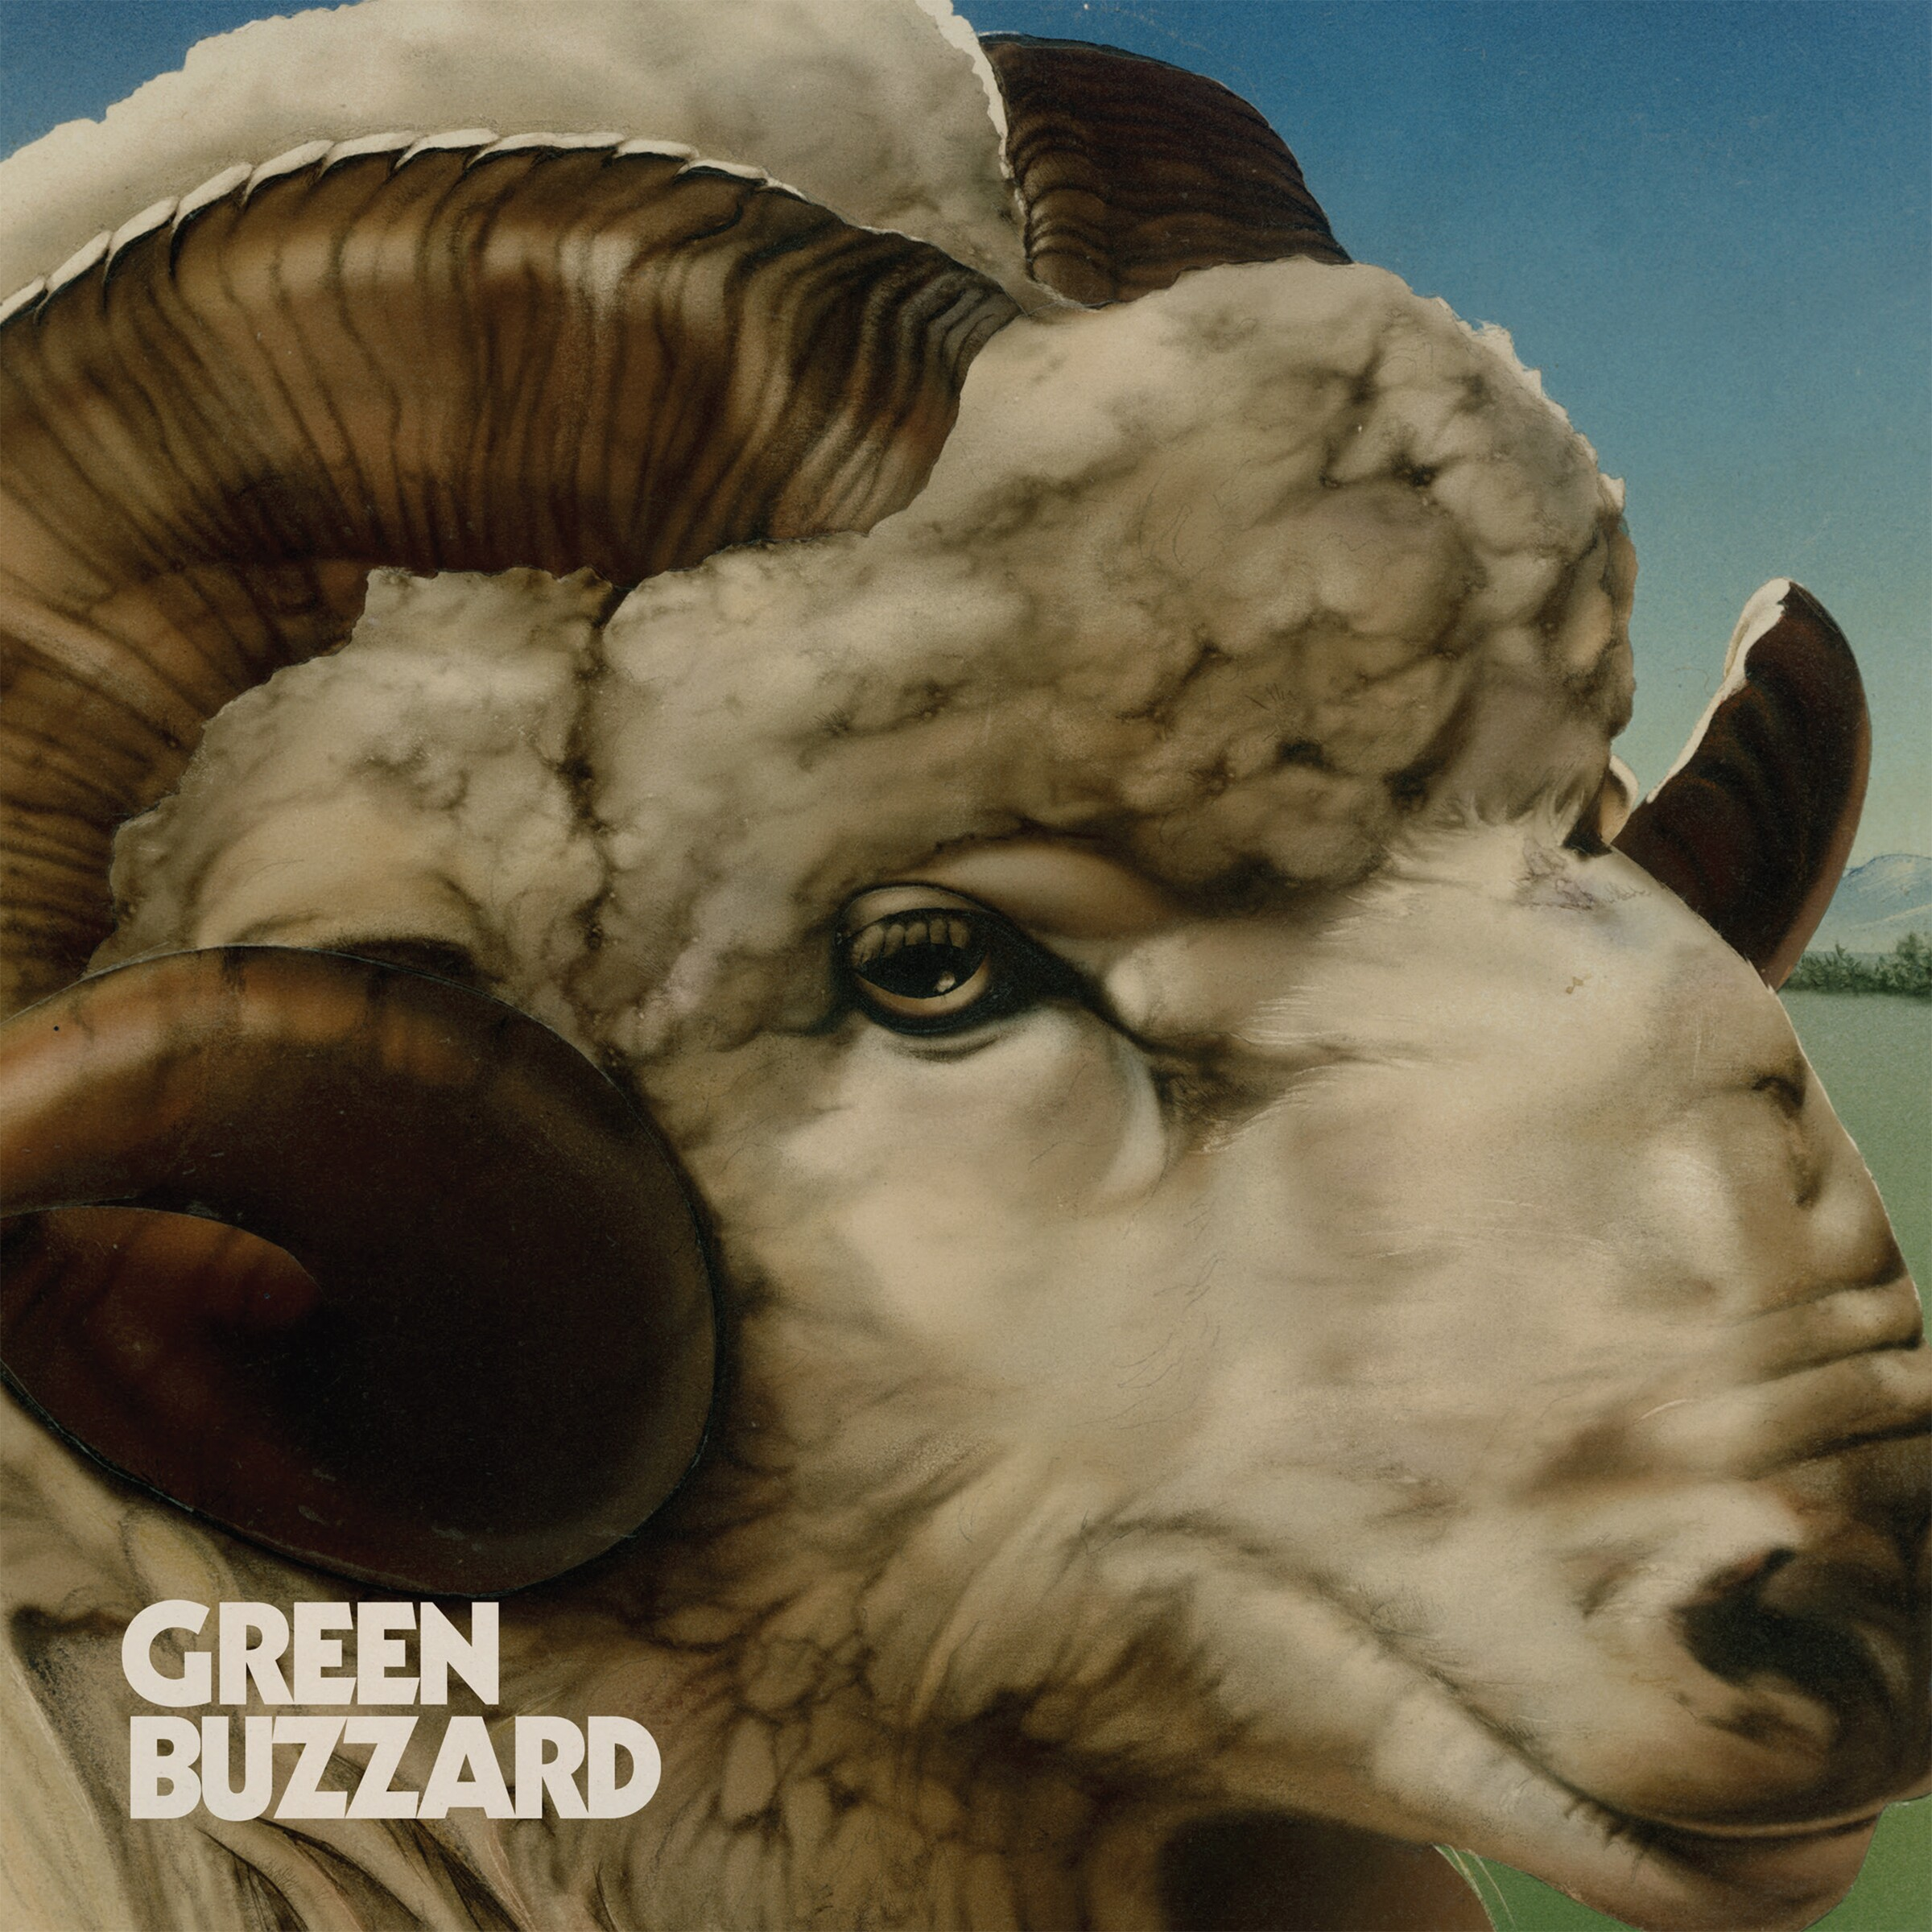 Green Buzzard - Slow It Down Now